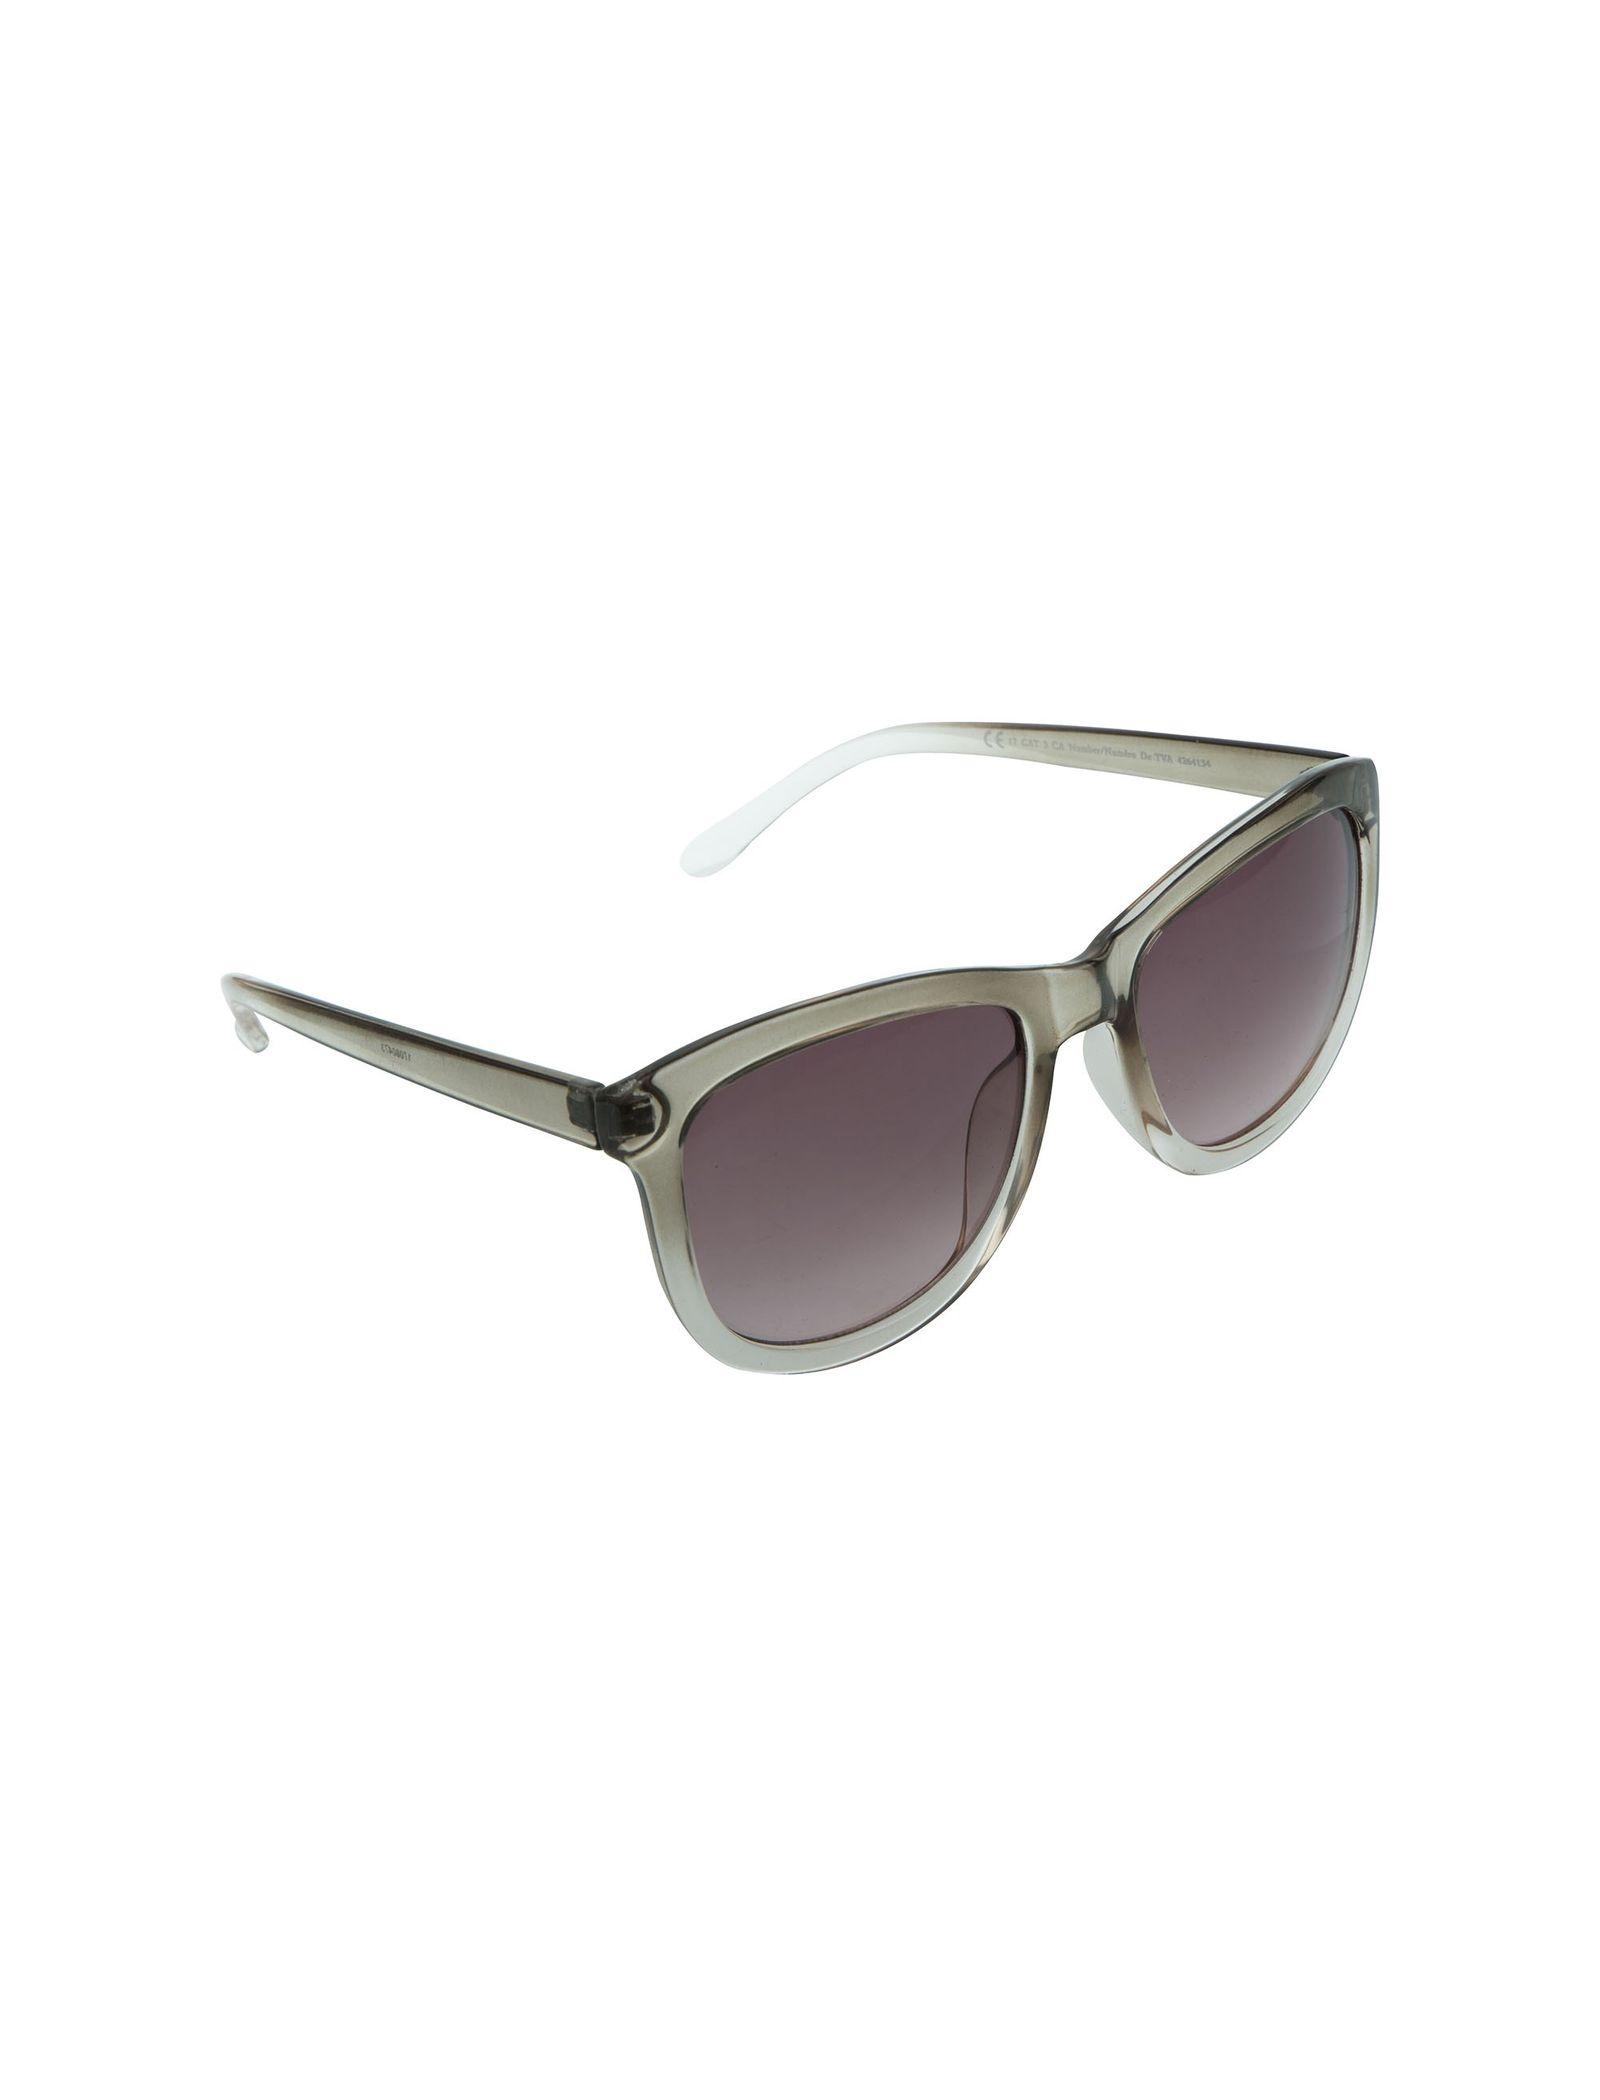 عینک آفتابی ویفرر زنانه - پی سز - قهوه اي  - 2